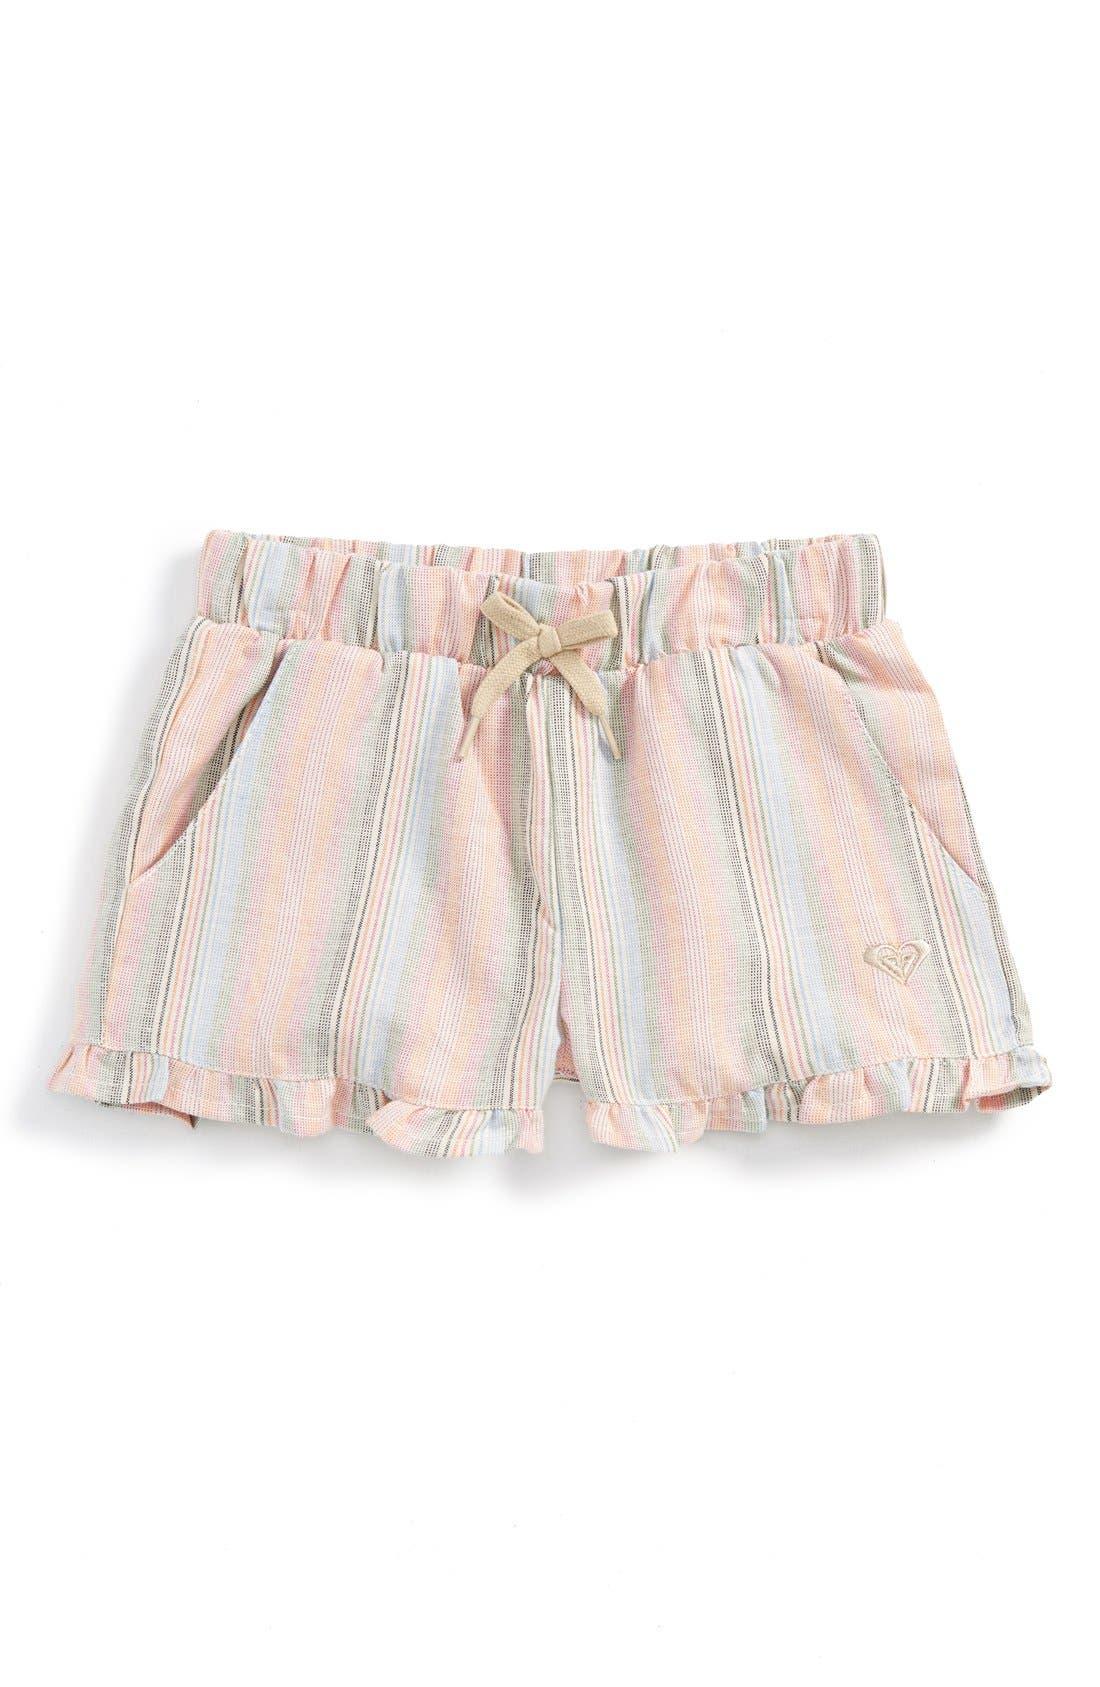 Main Image - Roxy 'Ruffled Feathers' Stripe Shorts (Baby Girls)